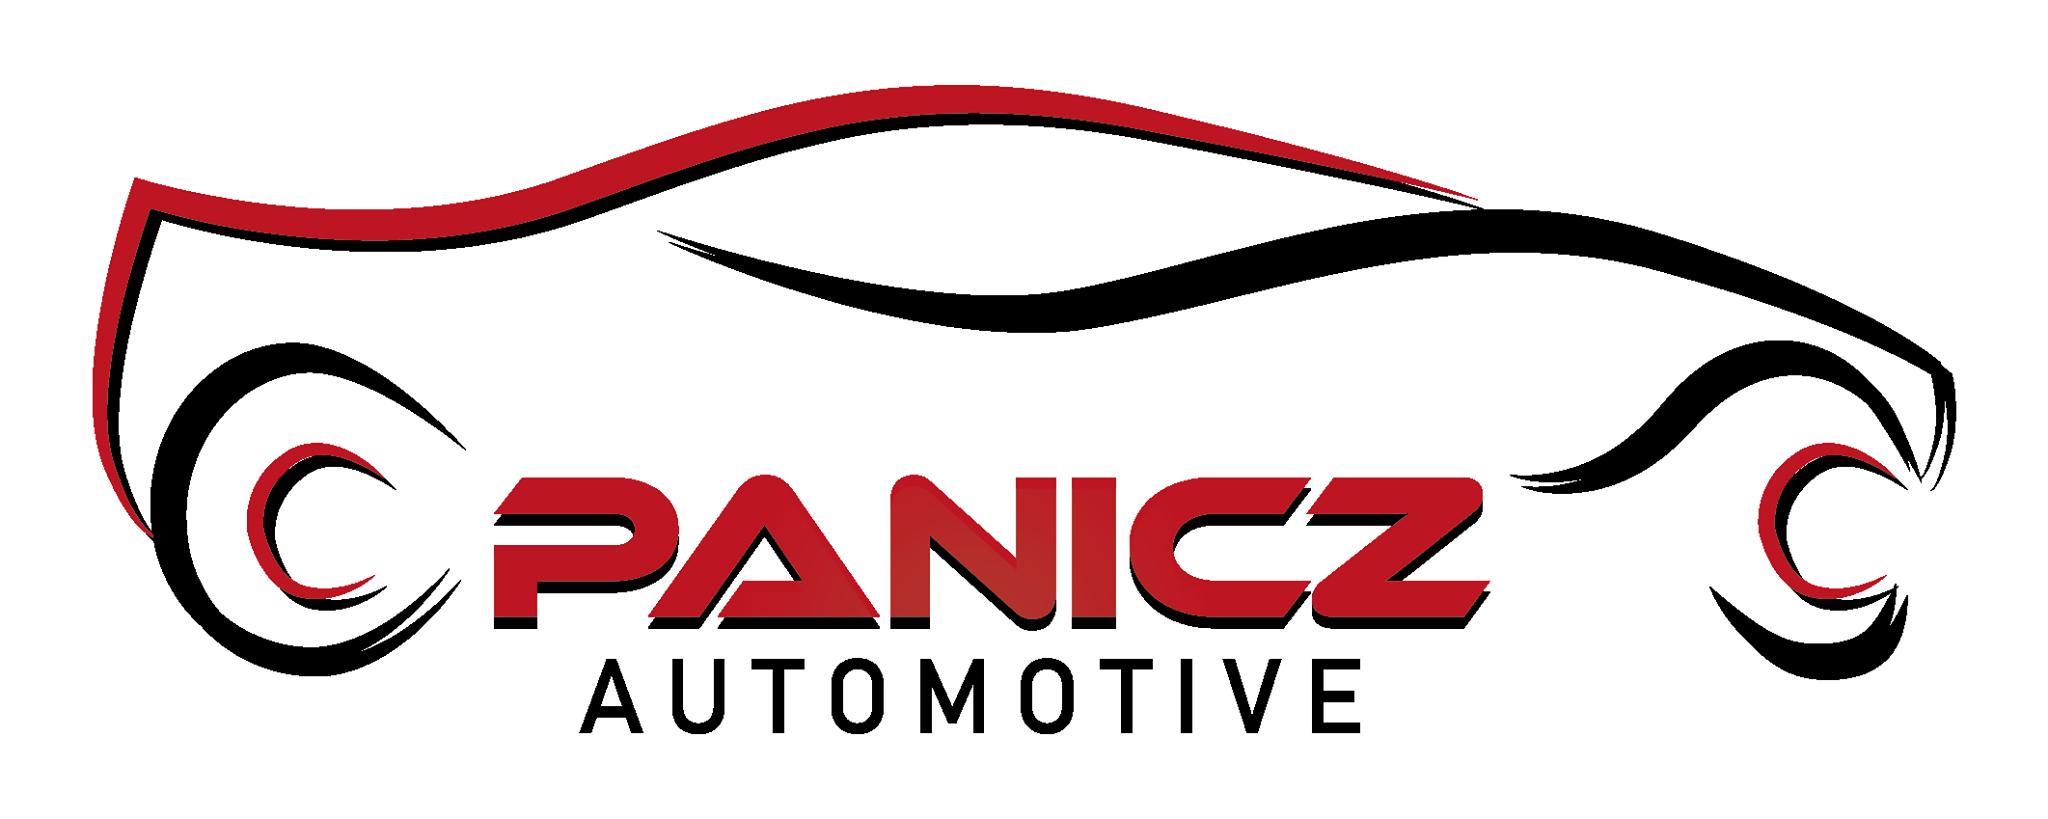 Panicz Automotive